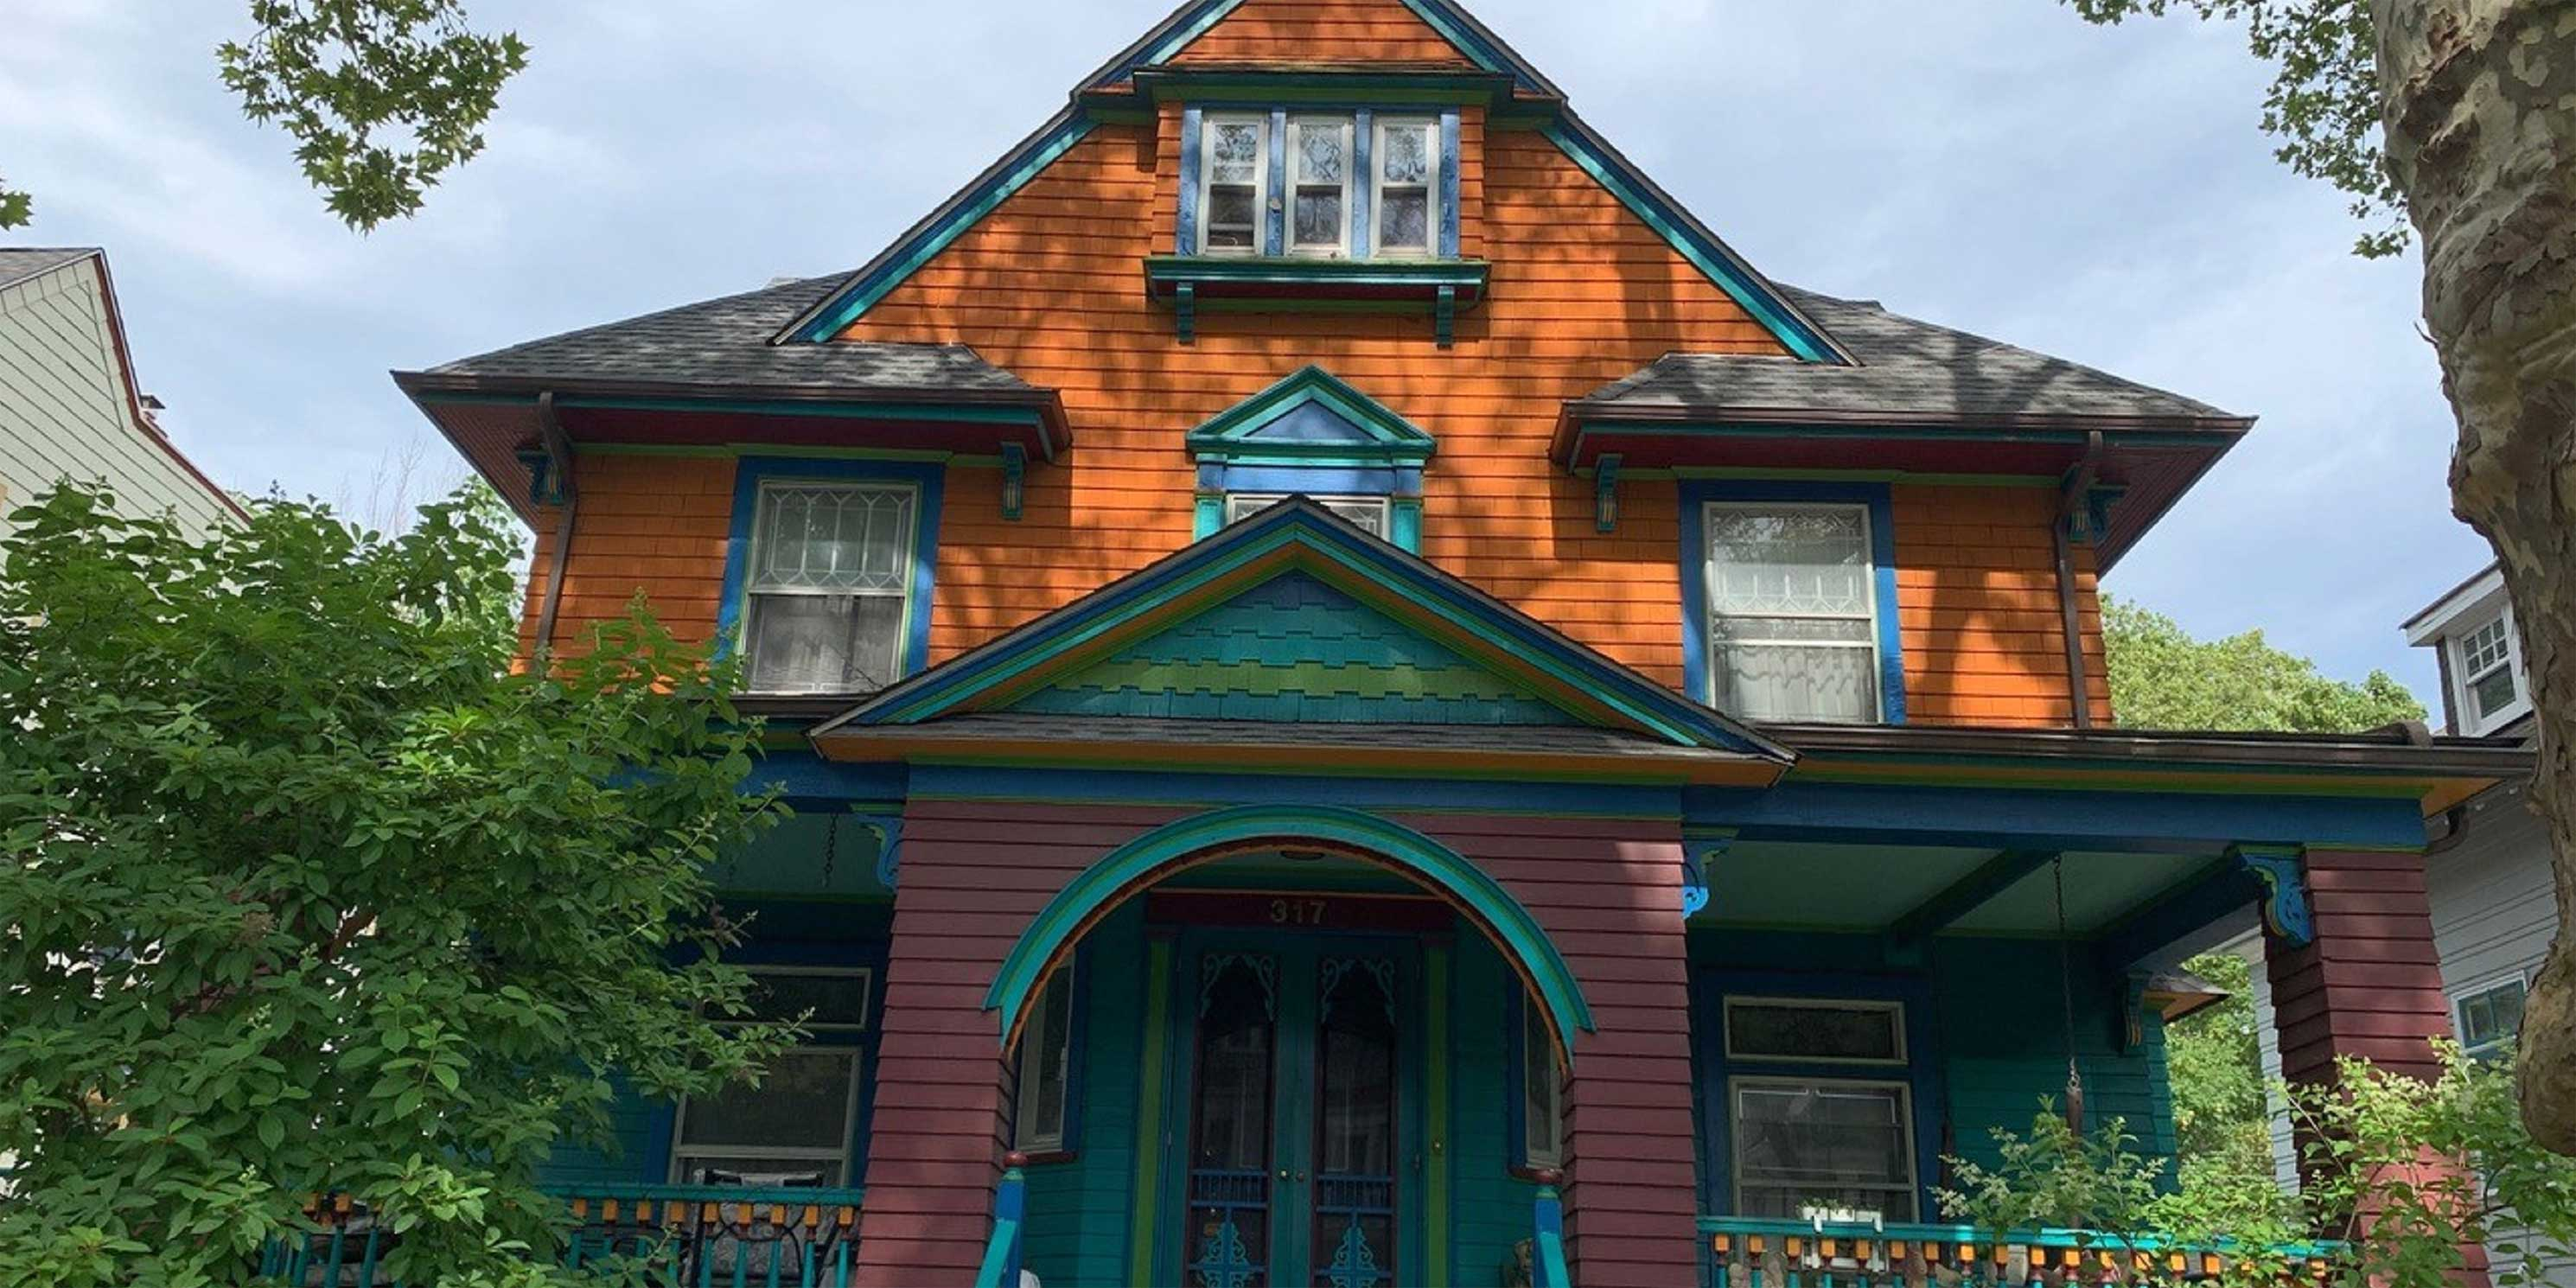 a Victorian home in Flatbush, Brooklyn